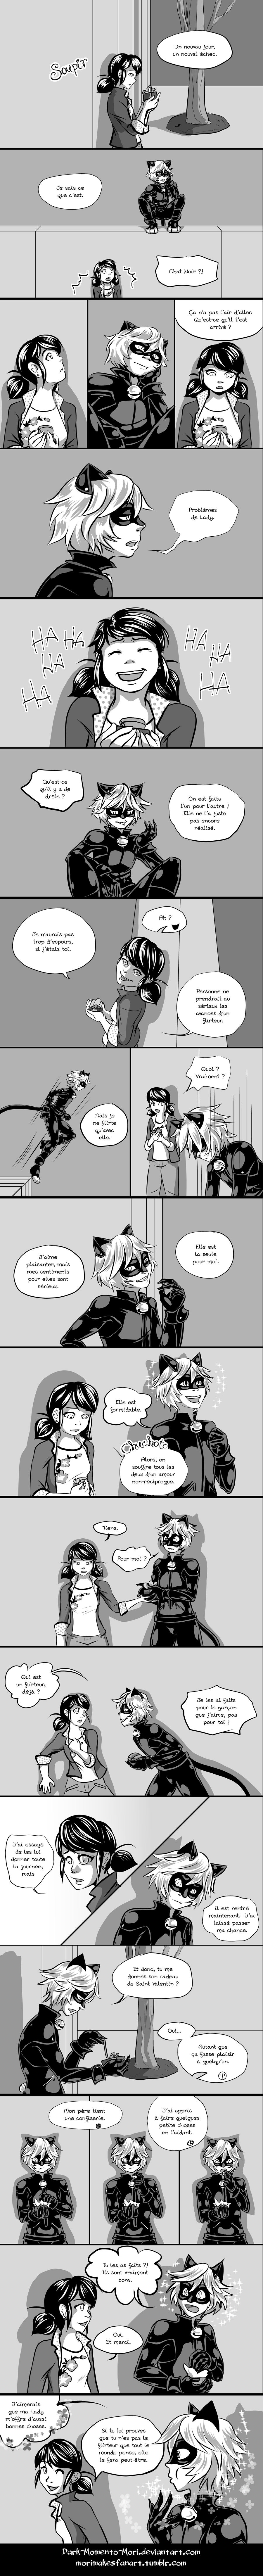 • Saint Valentin - Page 1 •